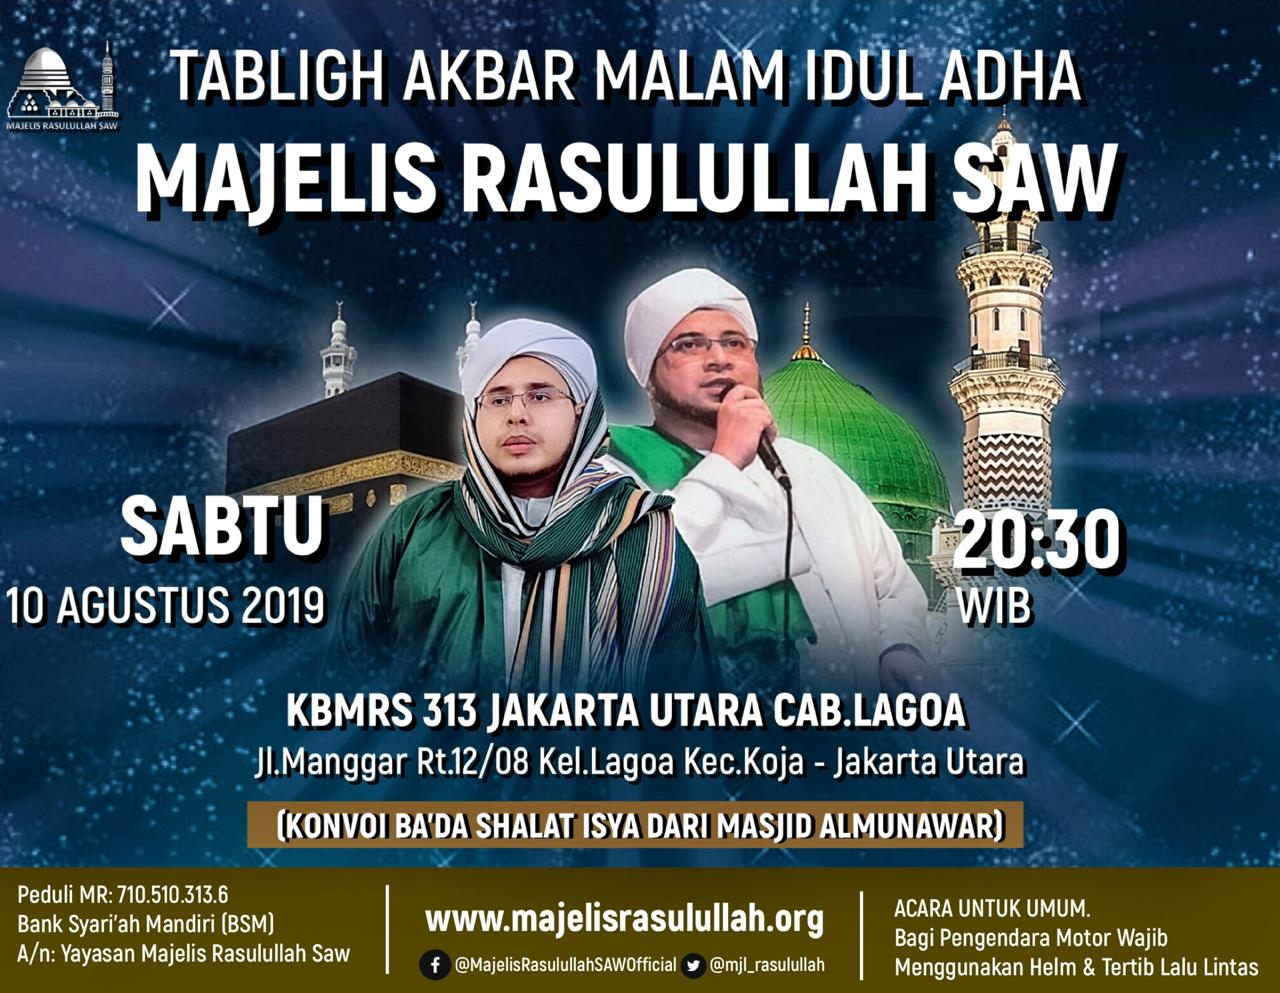 TABLIGH AKBAR MALAM EID ADHA 1440 H